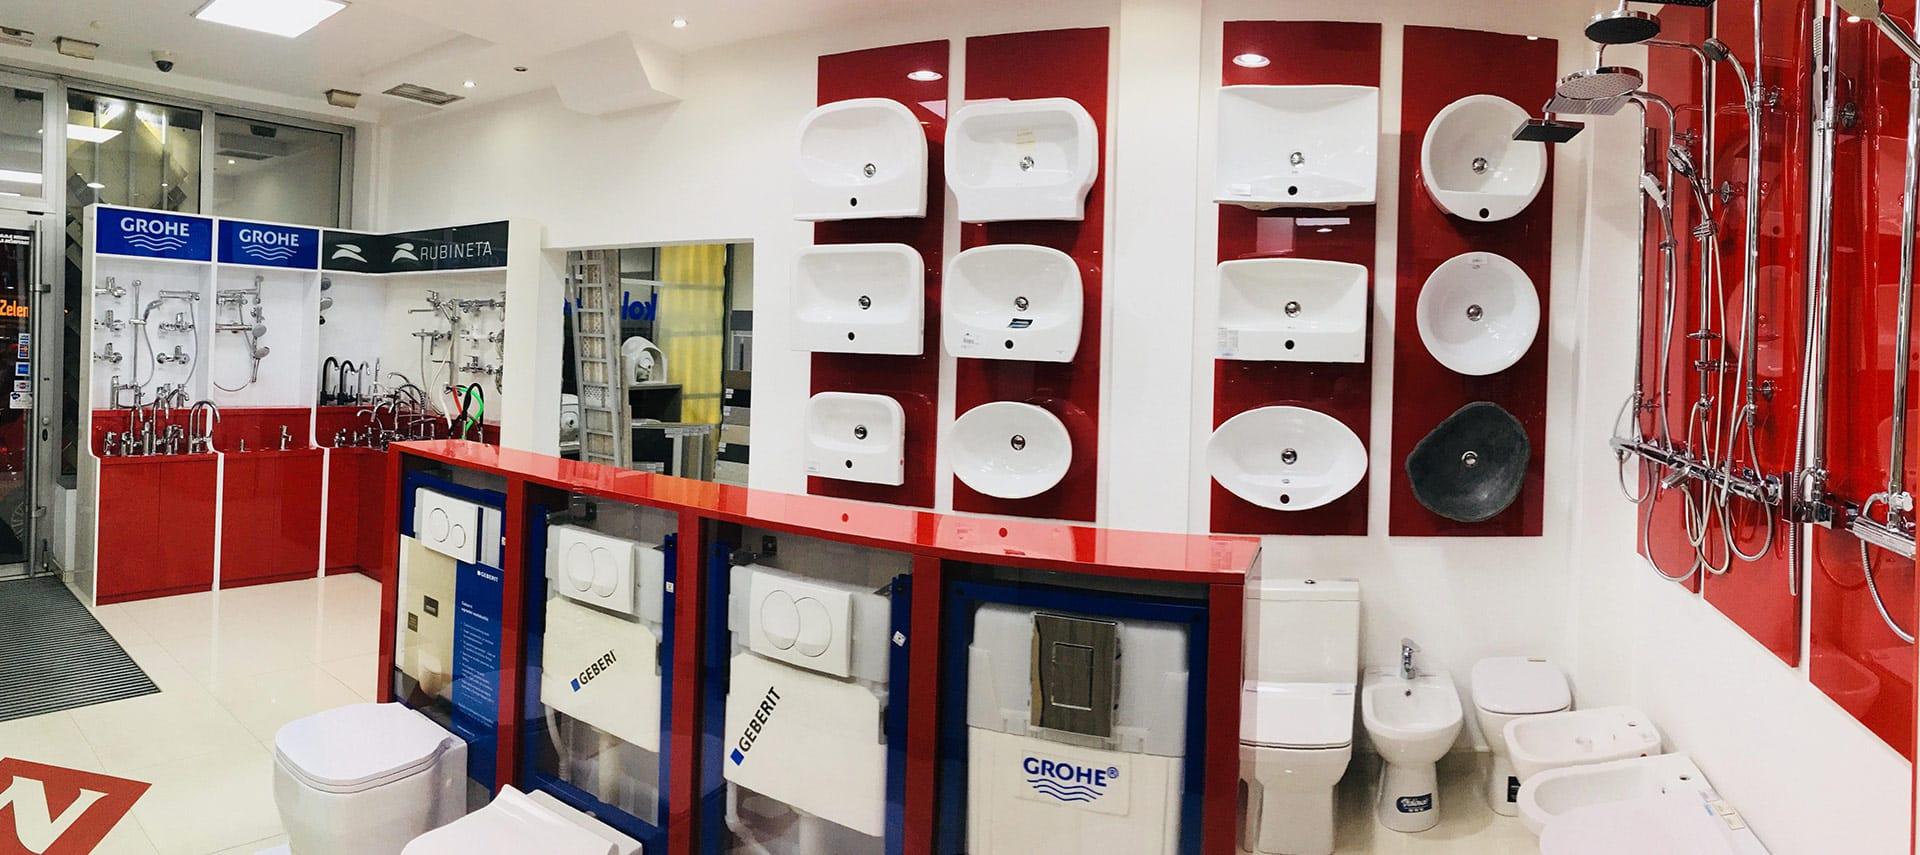 AKCIJA - Kompletno kupatilo za 499€!